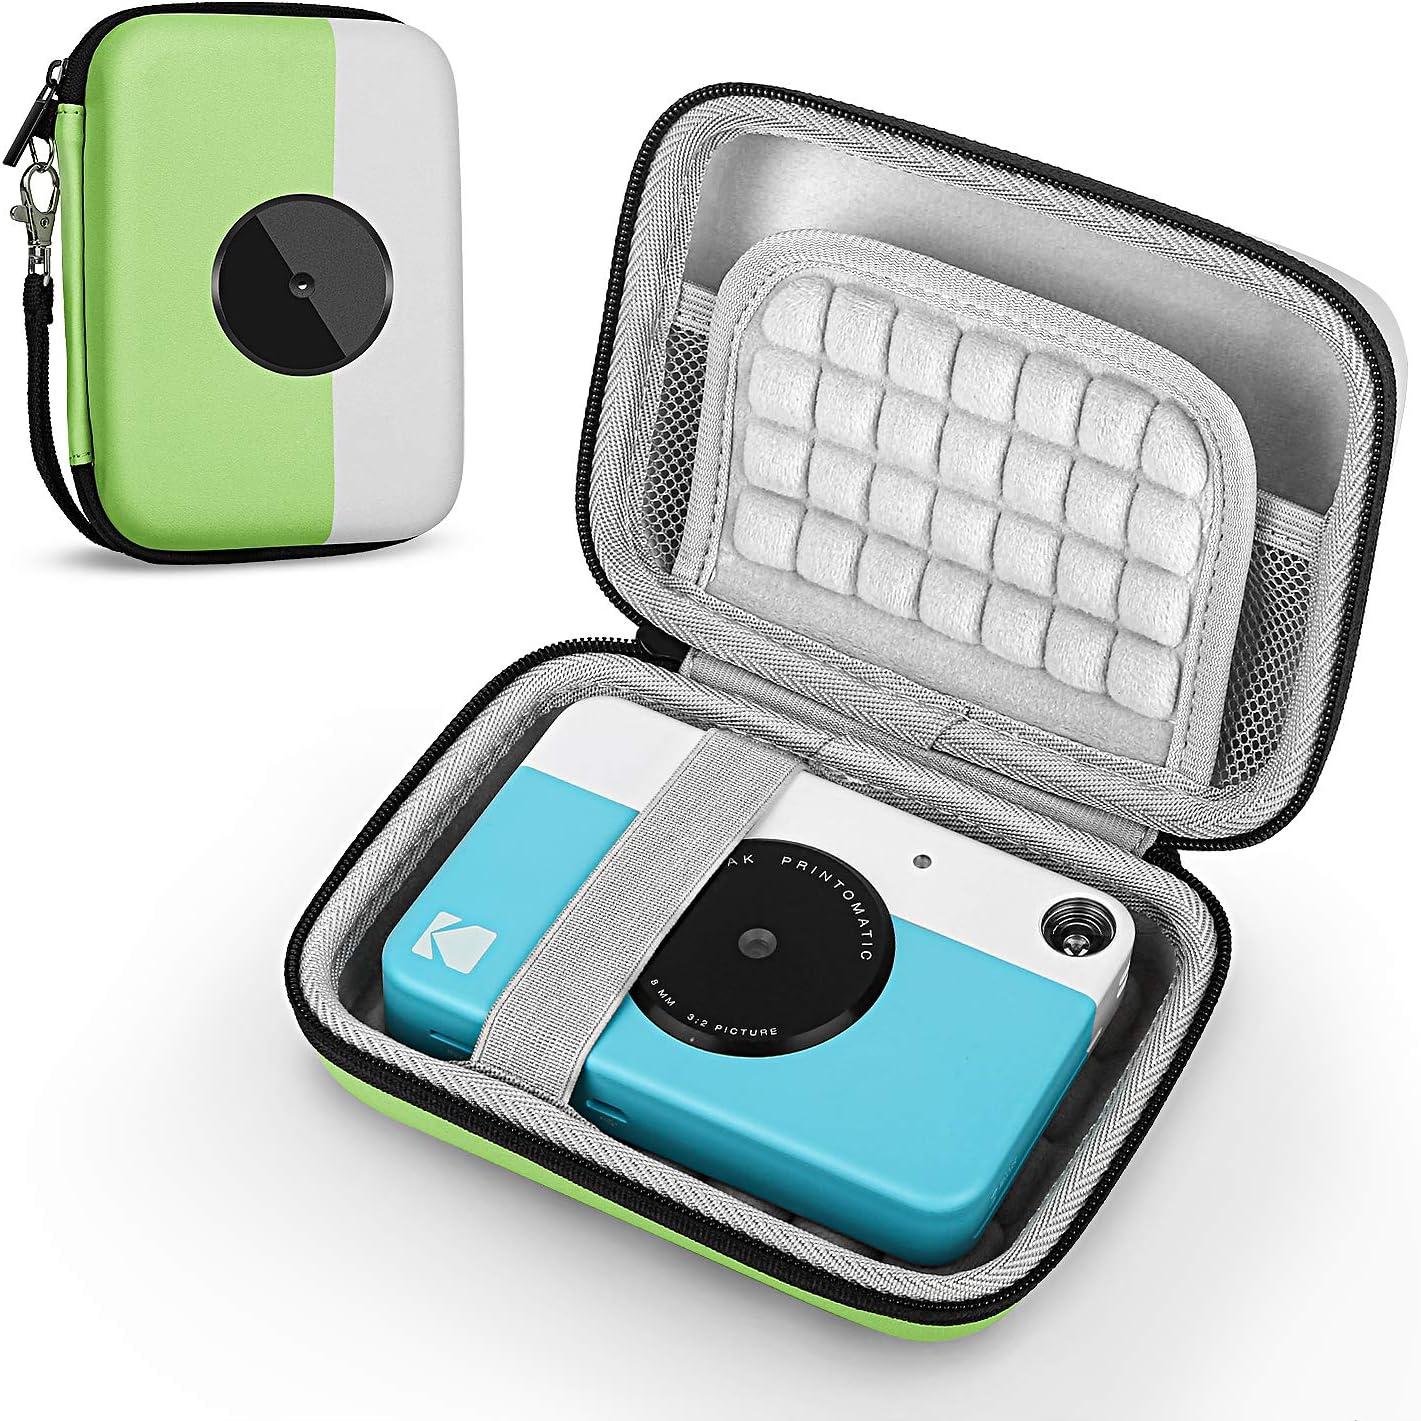 Fromsky Case for Kodak PRINTOMATIC/Smile Instant Print Digital Camera, Travel Carry Case Protective Cover (Green)